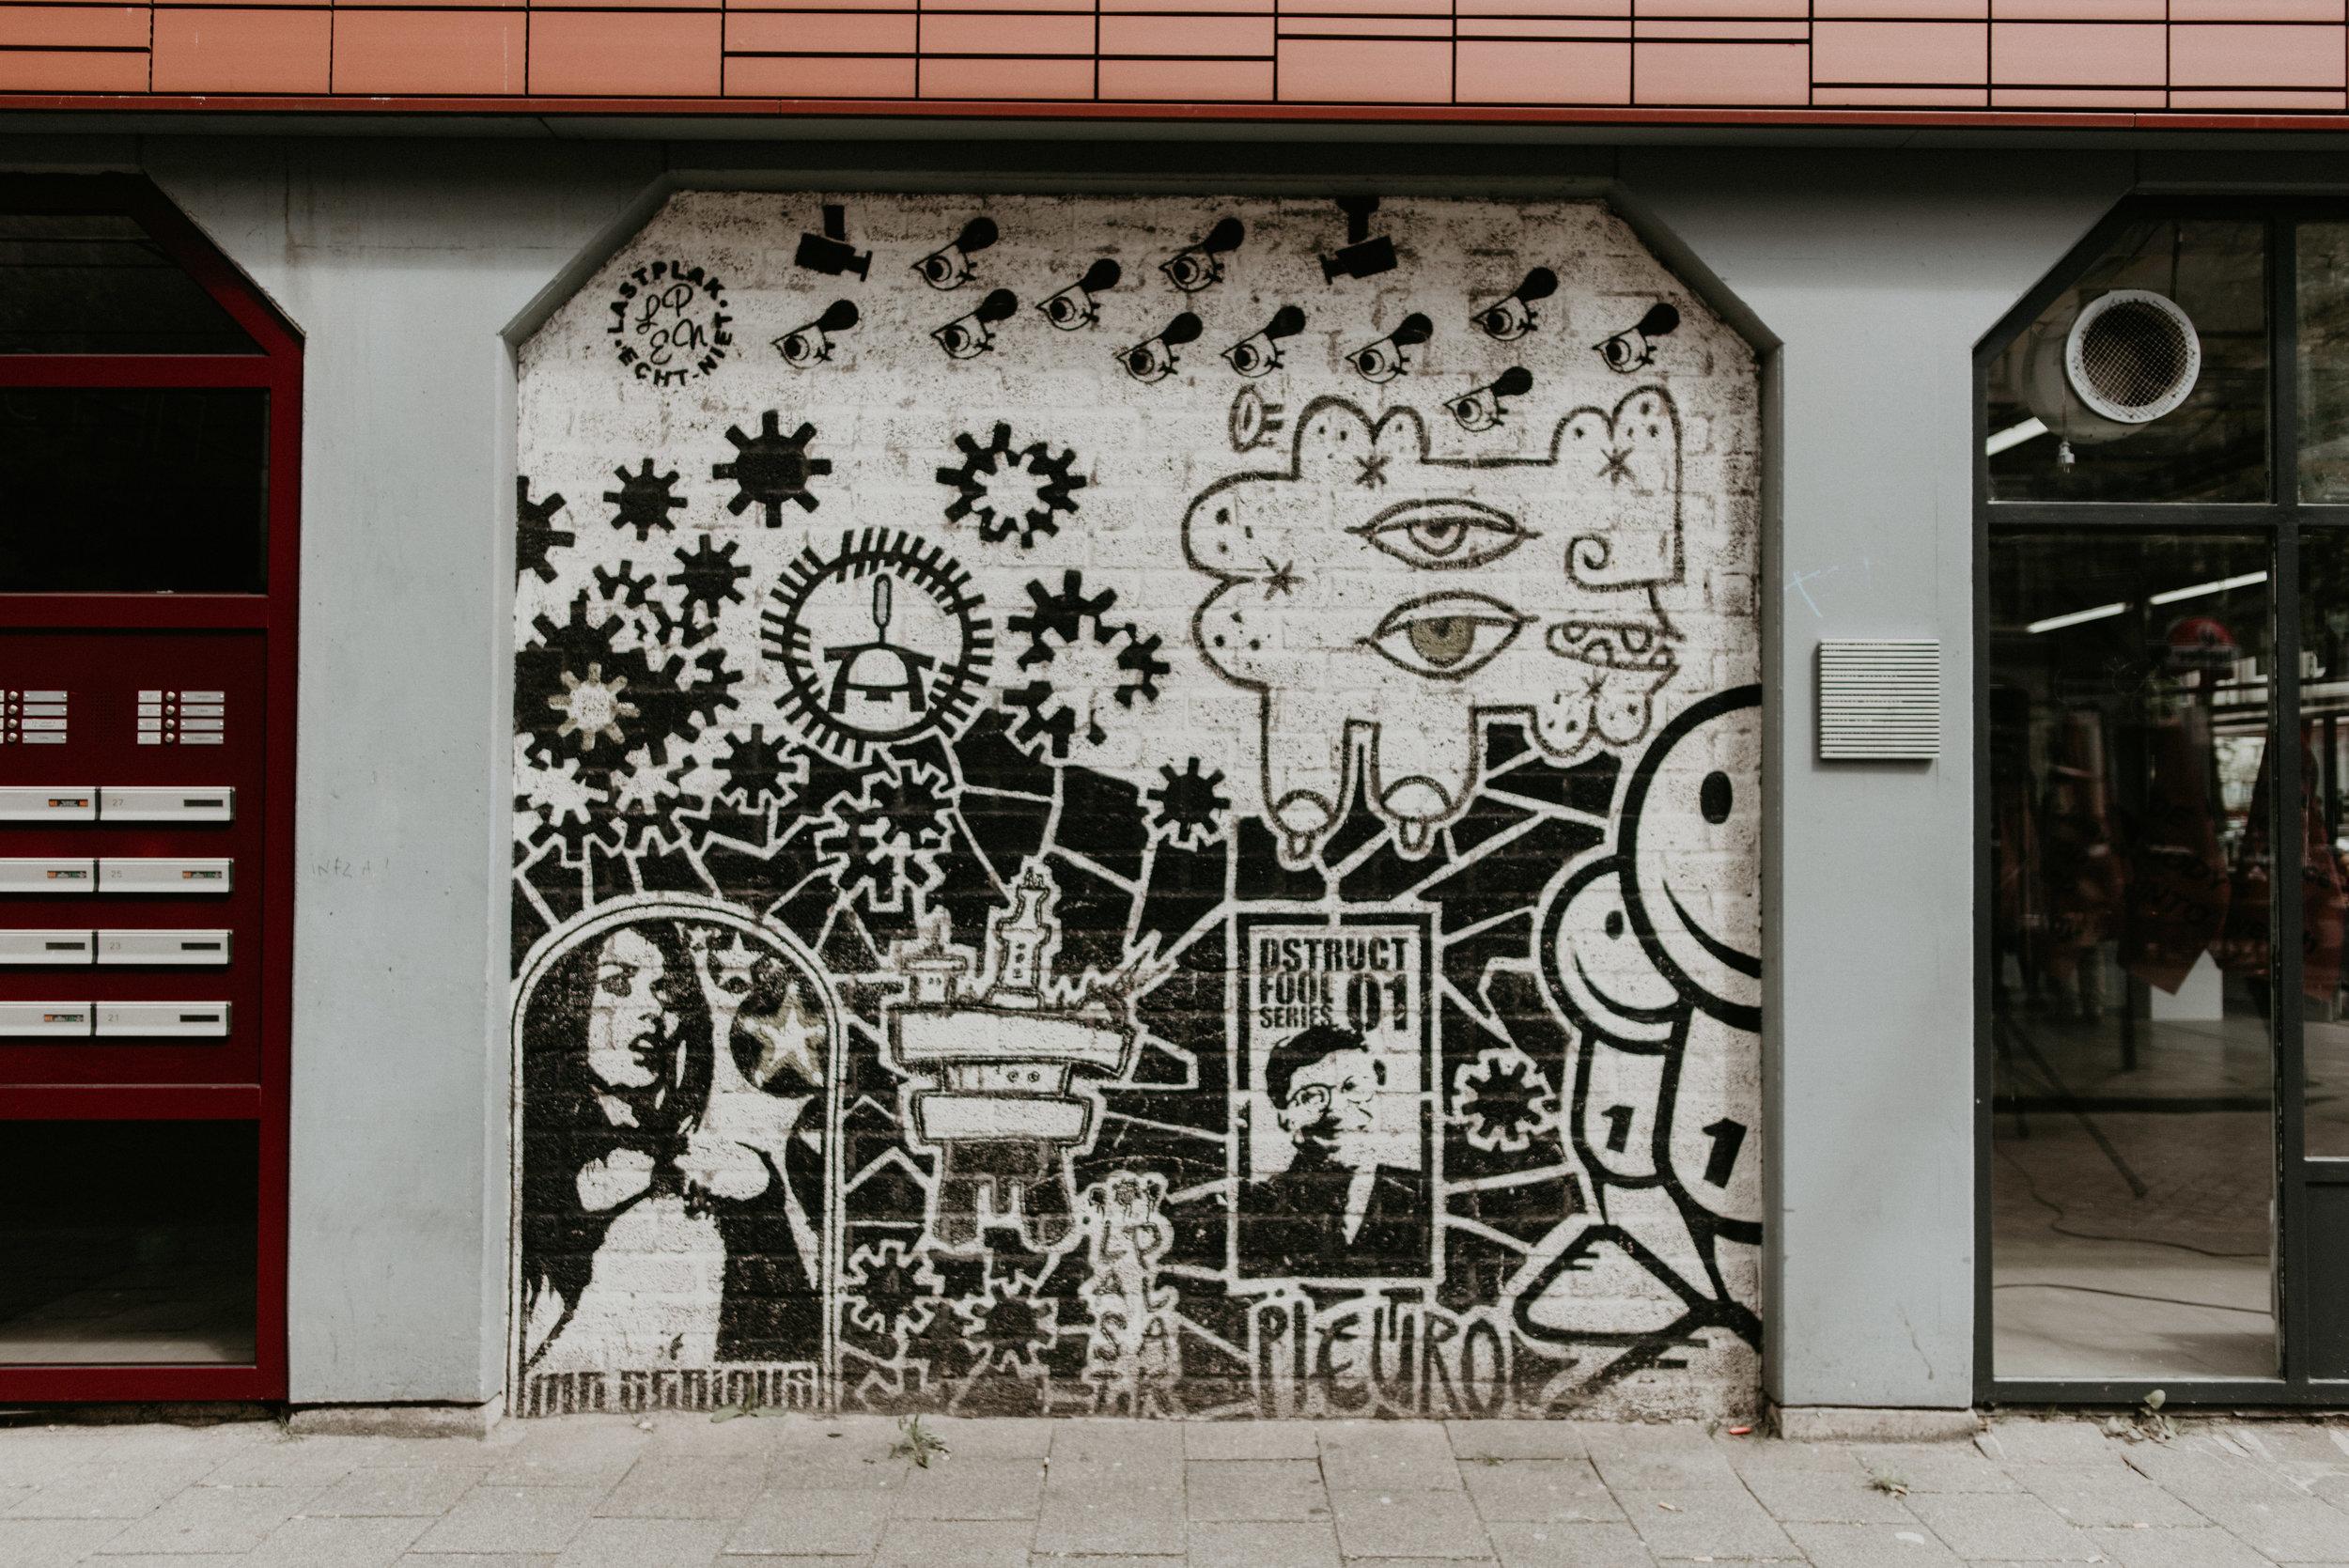 Rotterdam street art on Witte de withstraat